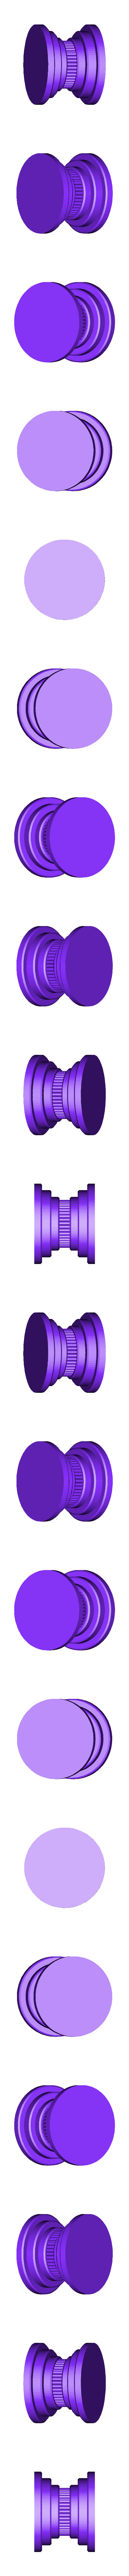 Spacing_Guild_Ship_part_3.stl Download free STL file Spacing Guild Ship • 3D printable object, poblocki1982